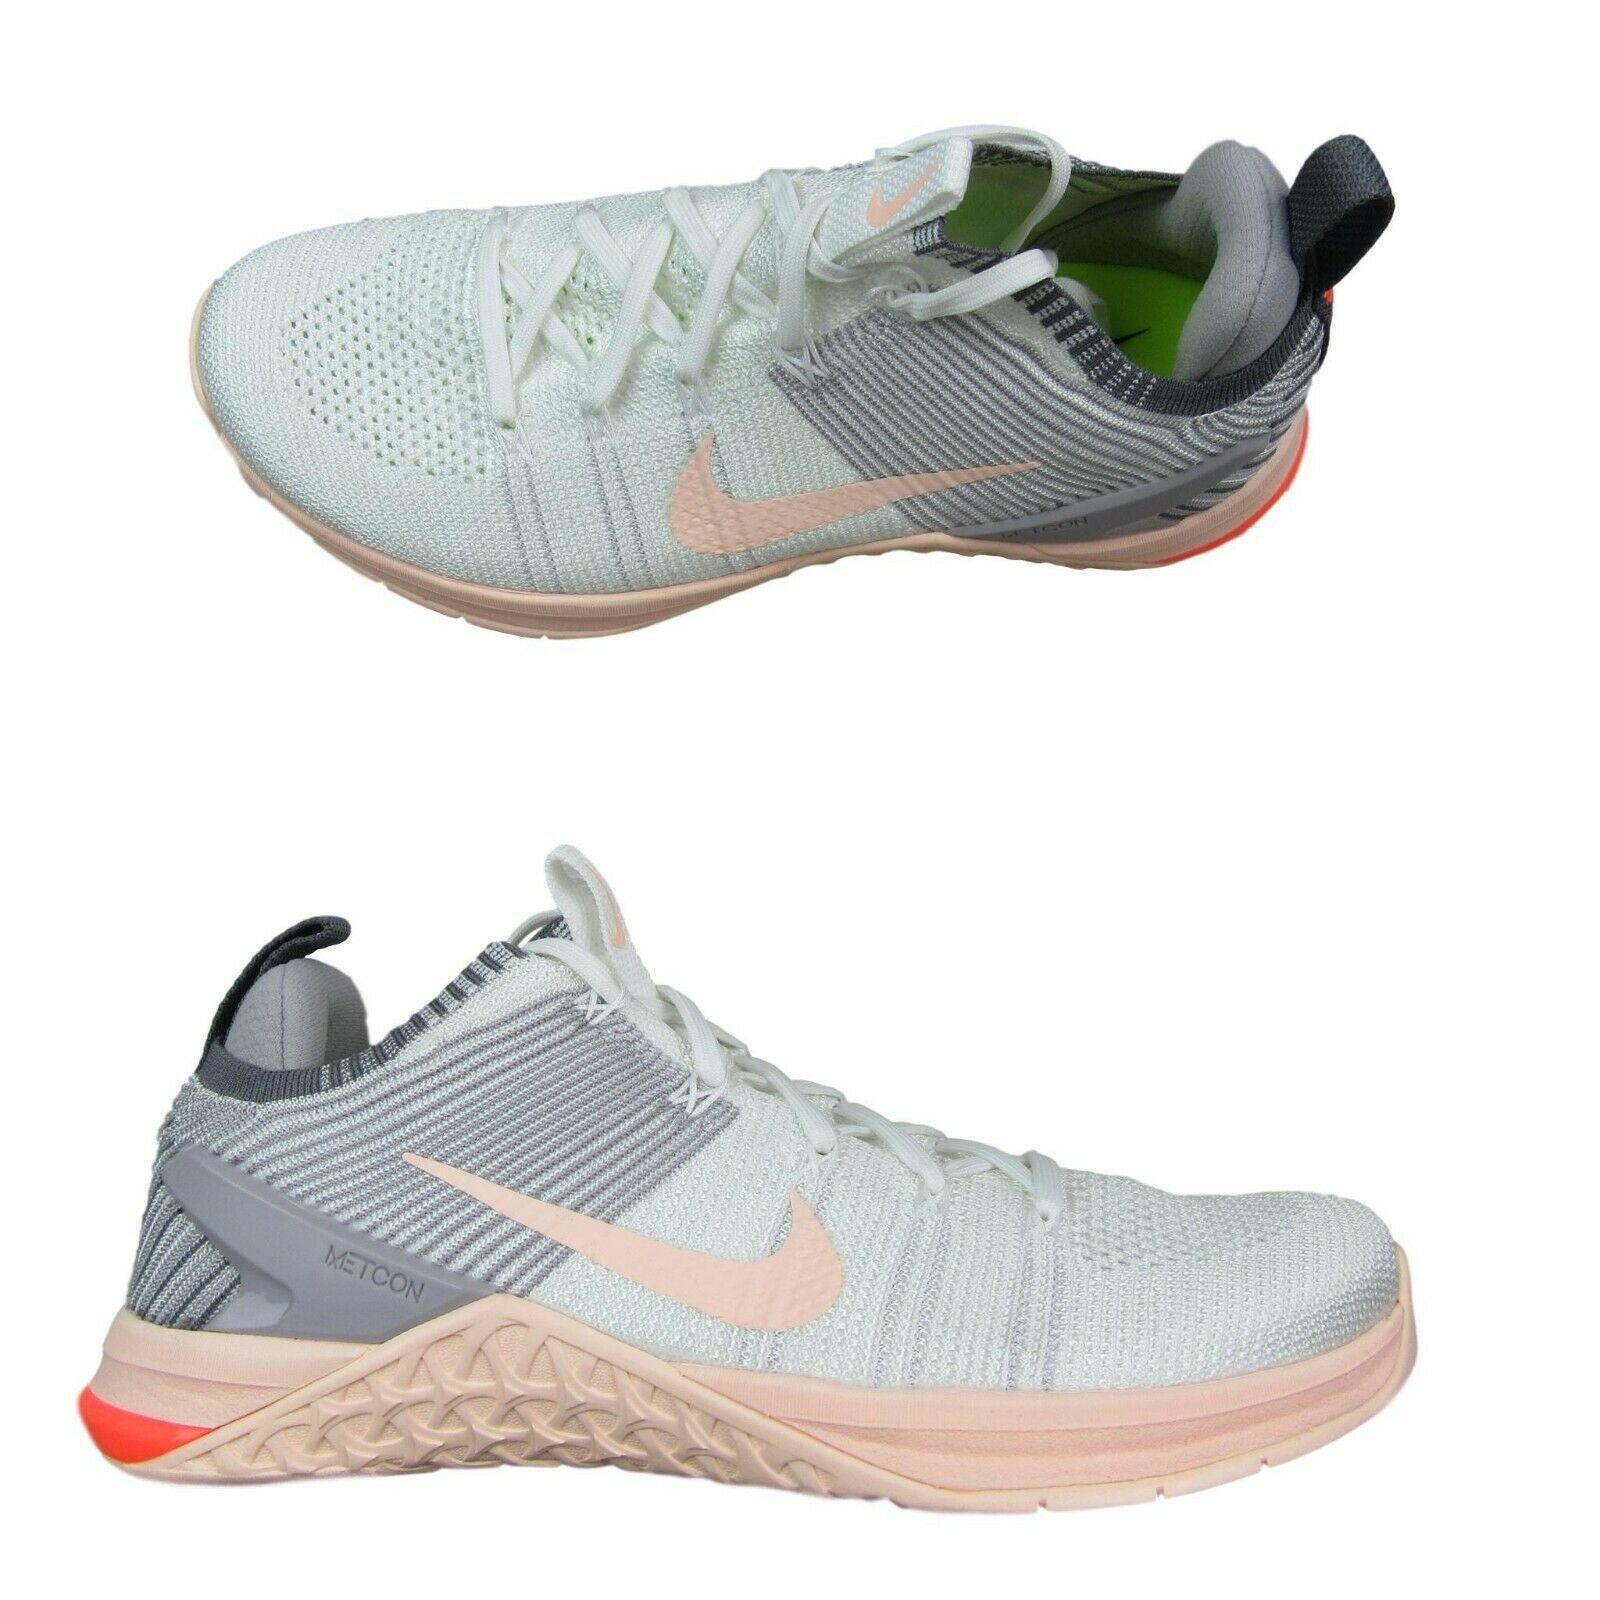 2c3604ba2c504 Nike Metcon DSX Flyknit 2 Womens Cross Training Gym Shoes Size 10 ...